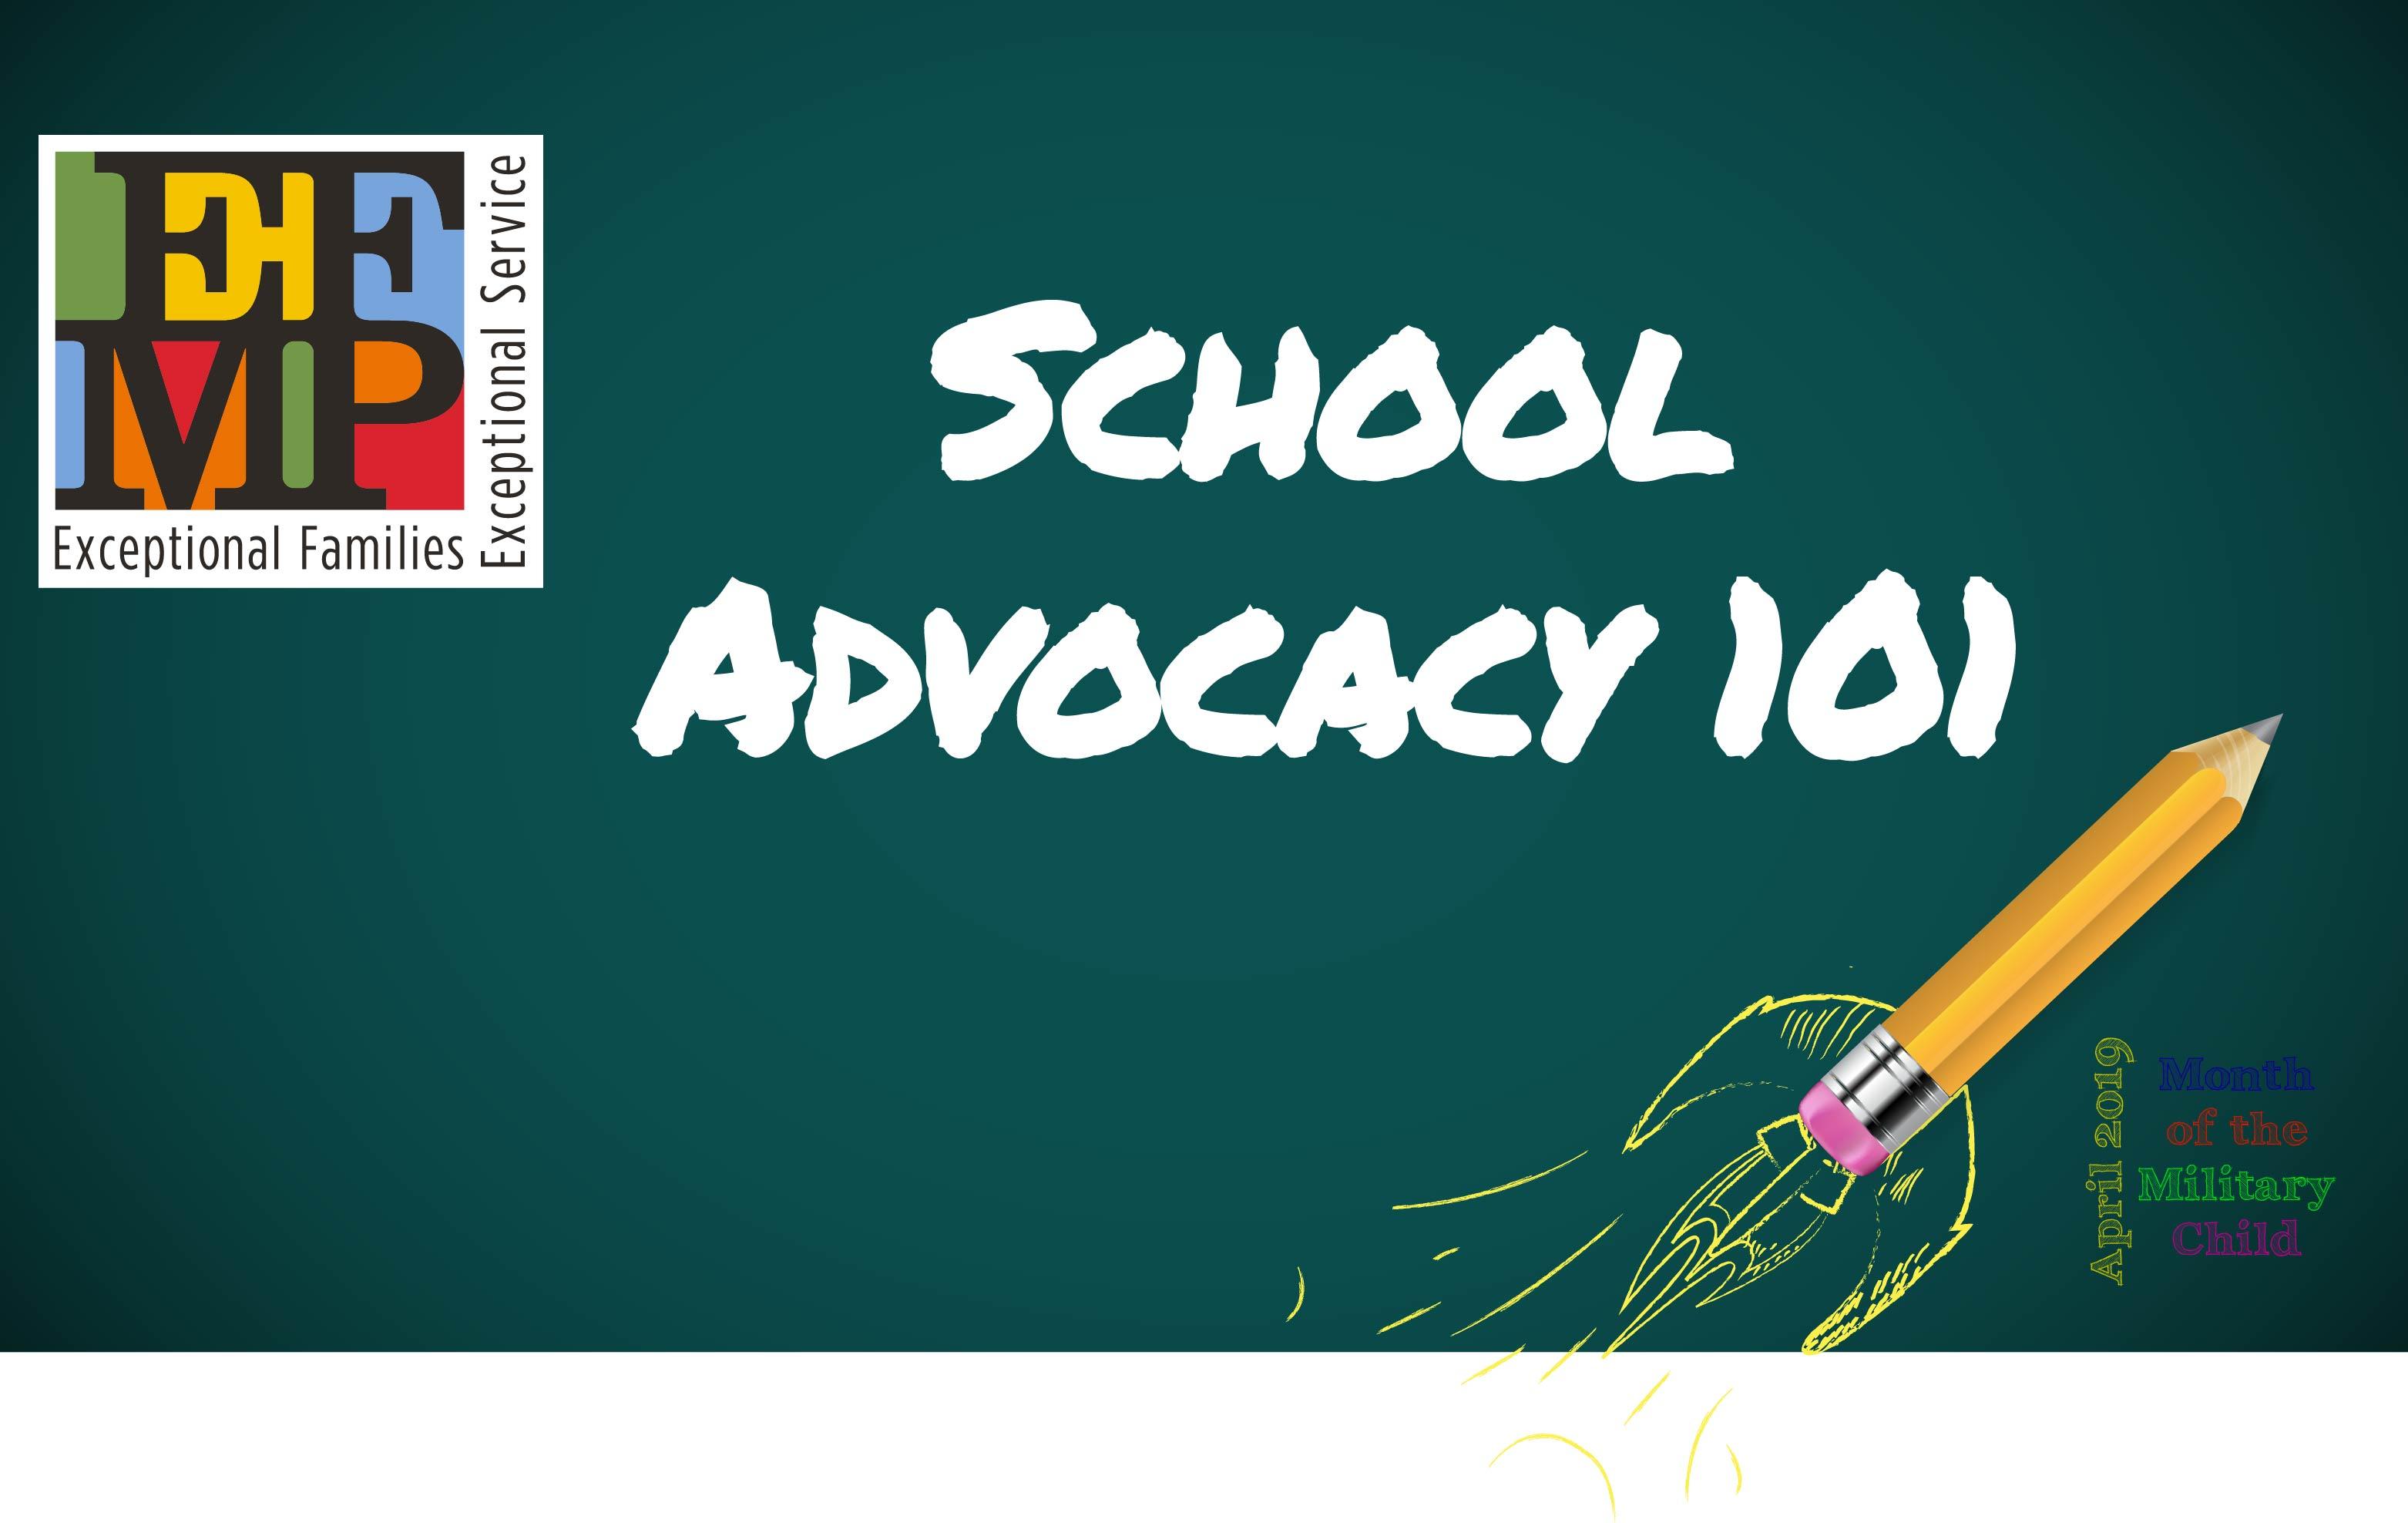 School Advocacy 101